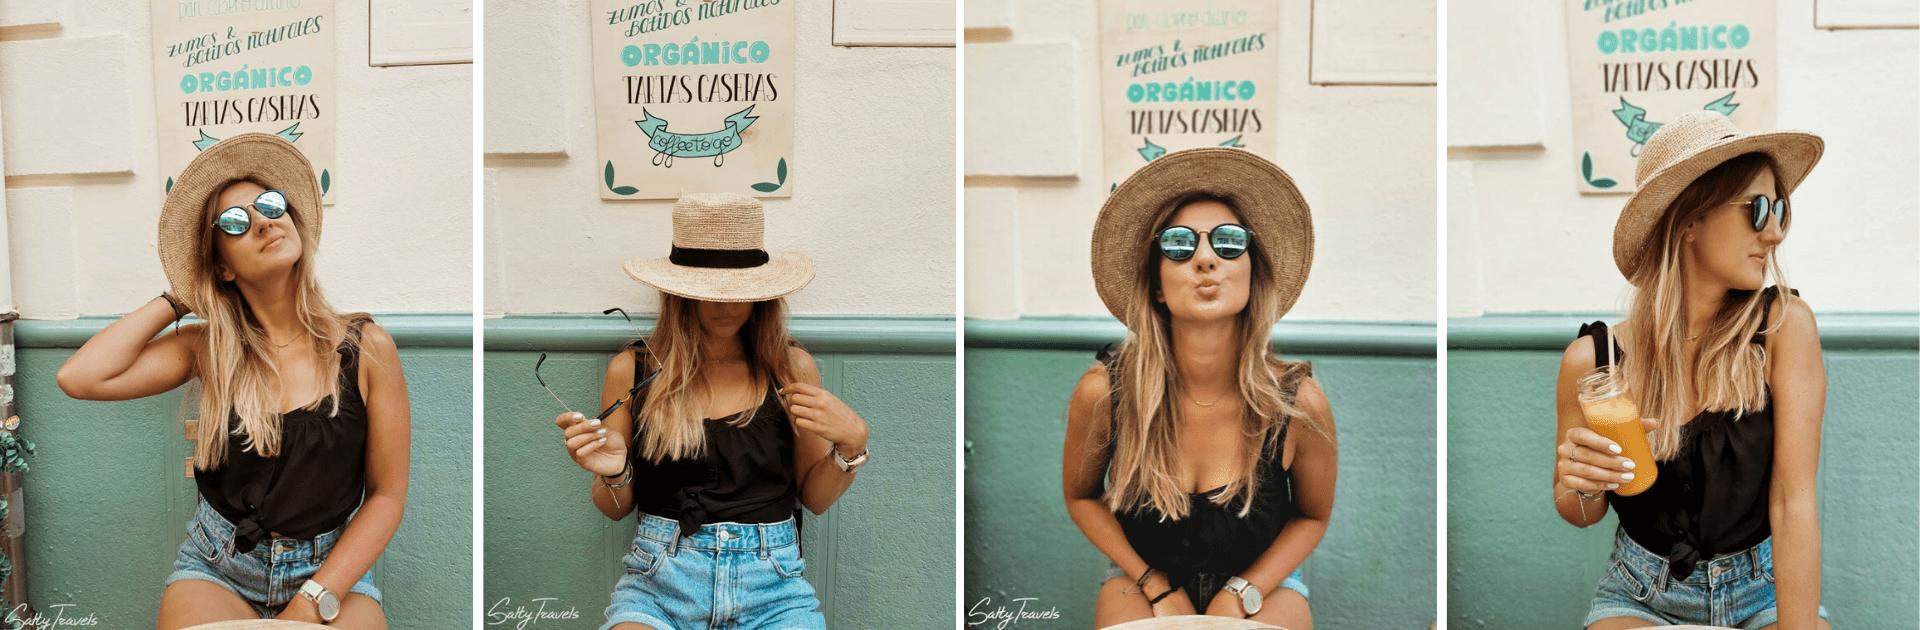 Paulina SaltyTravels